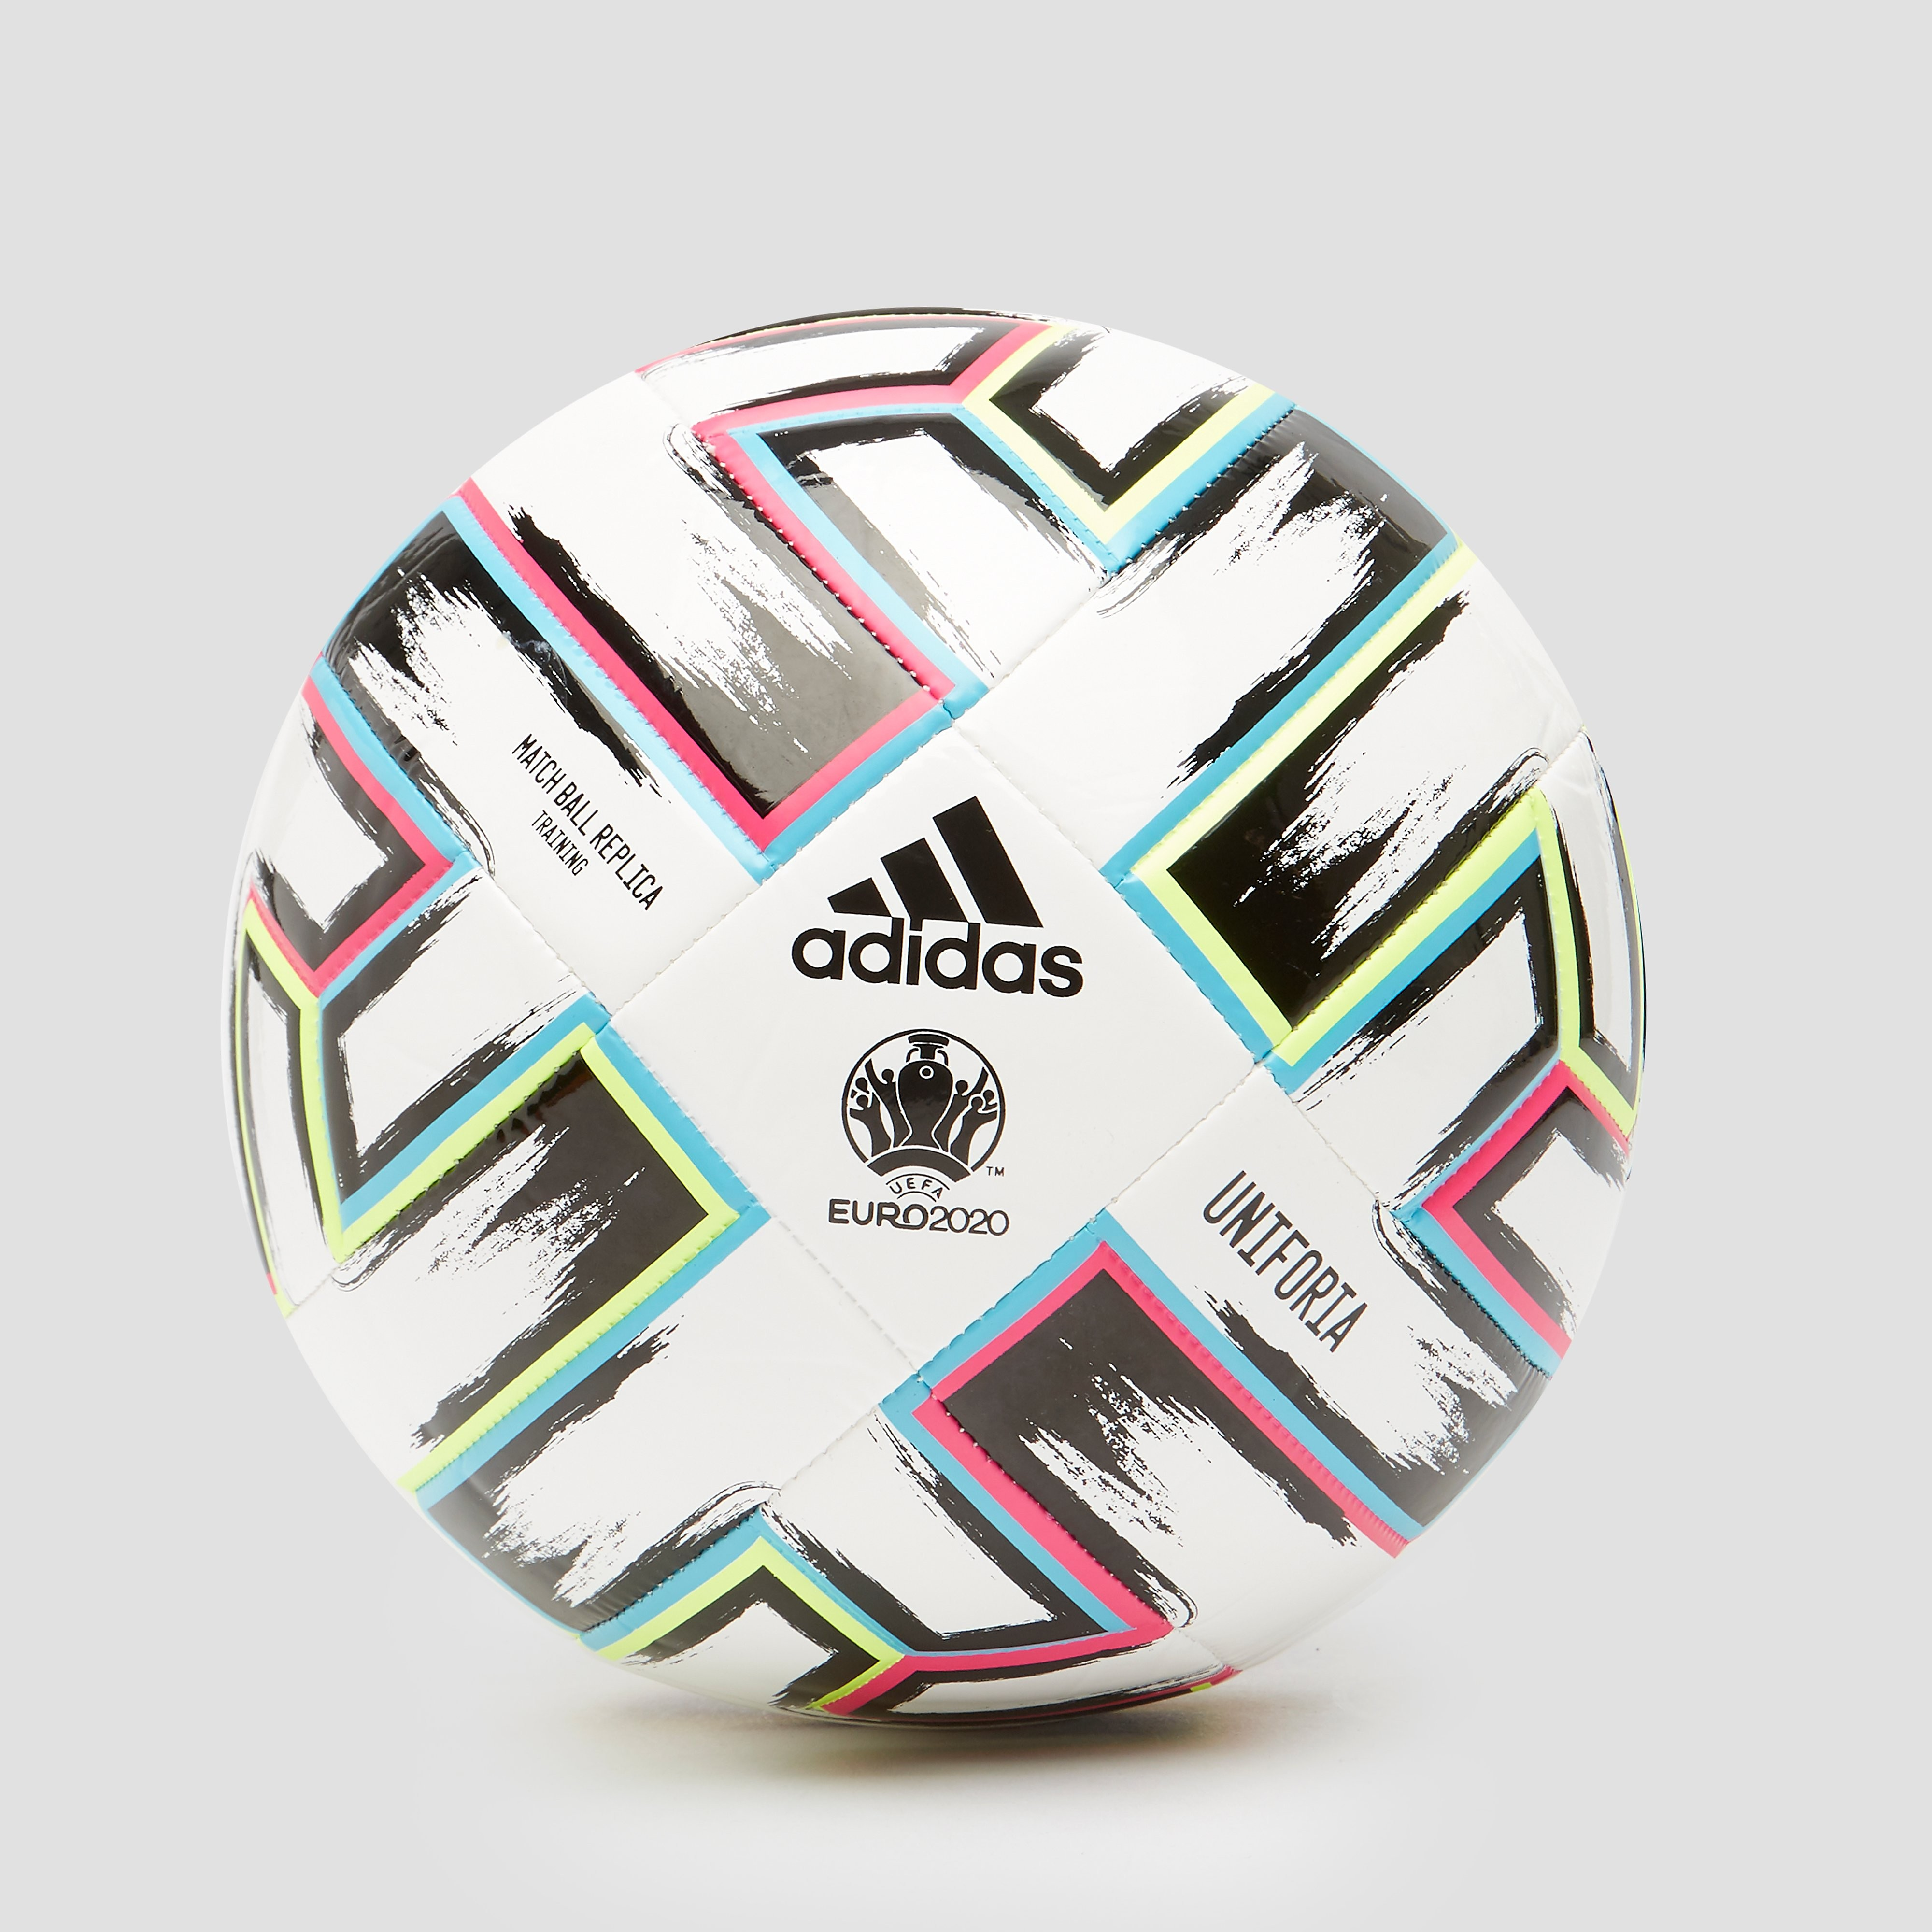 adidas Uniforia training ek 2020 voetbal wit-groen Kinderen